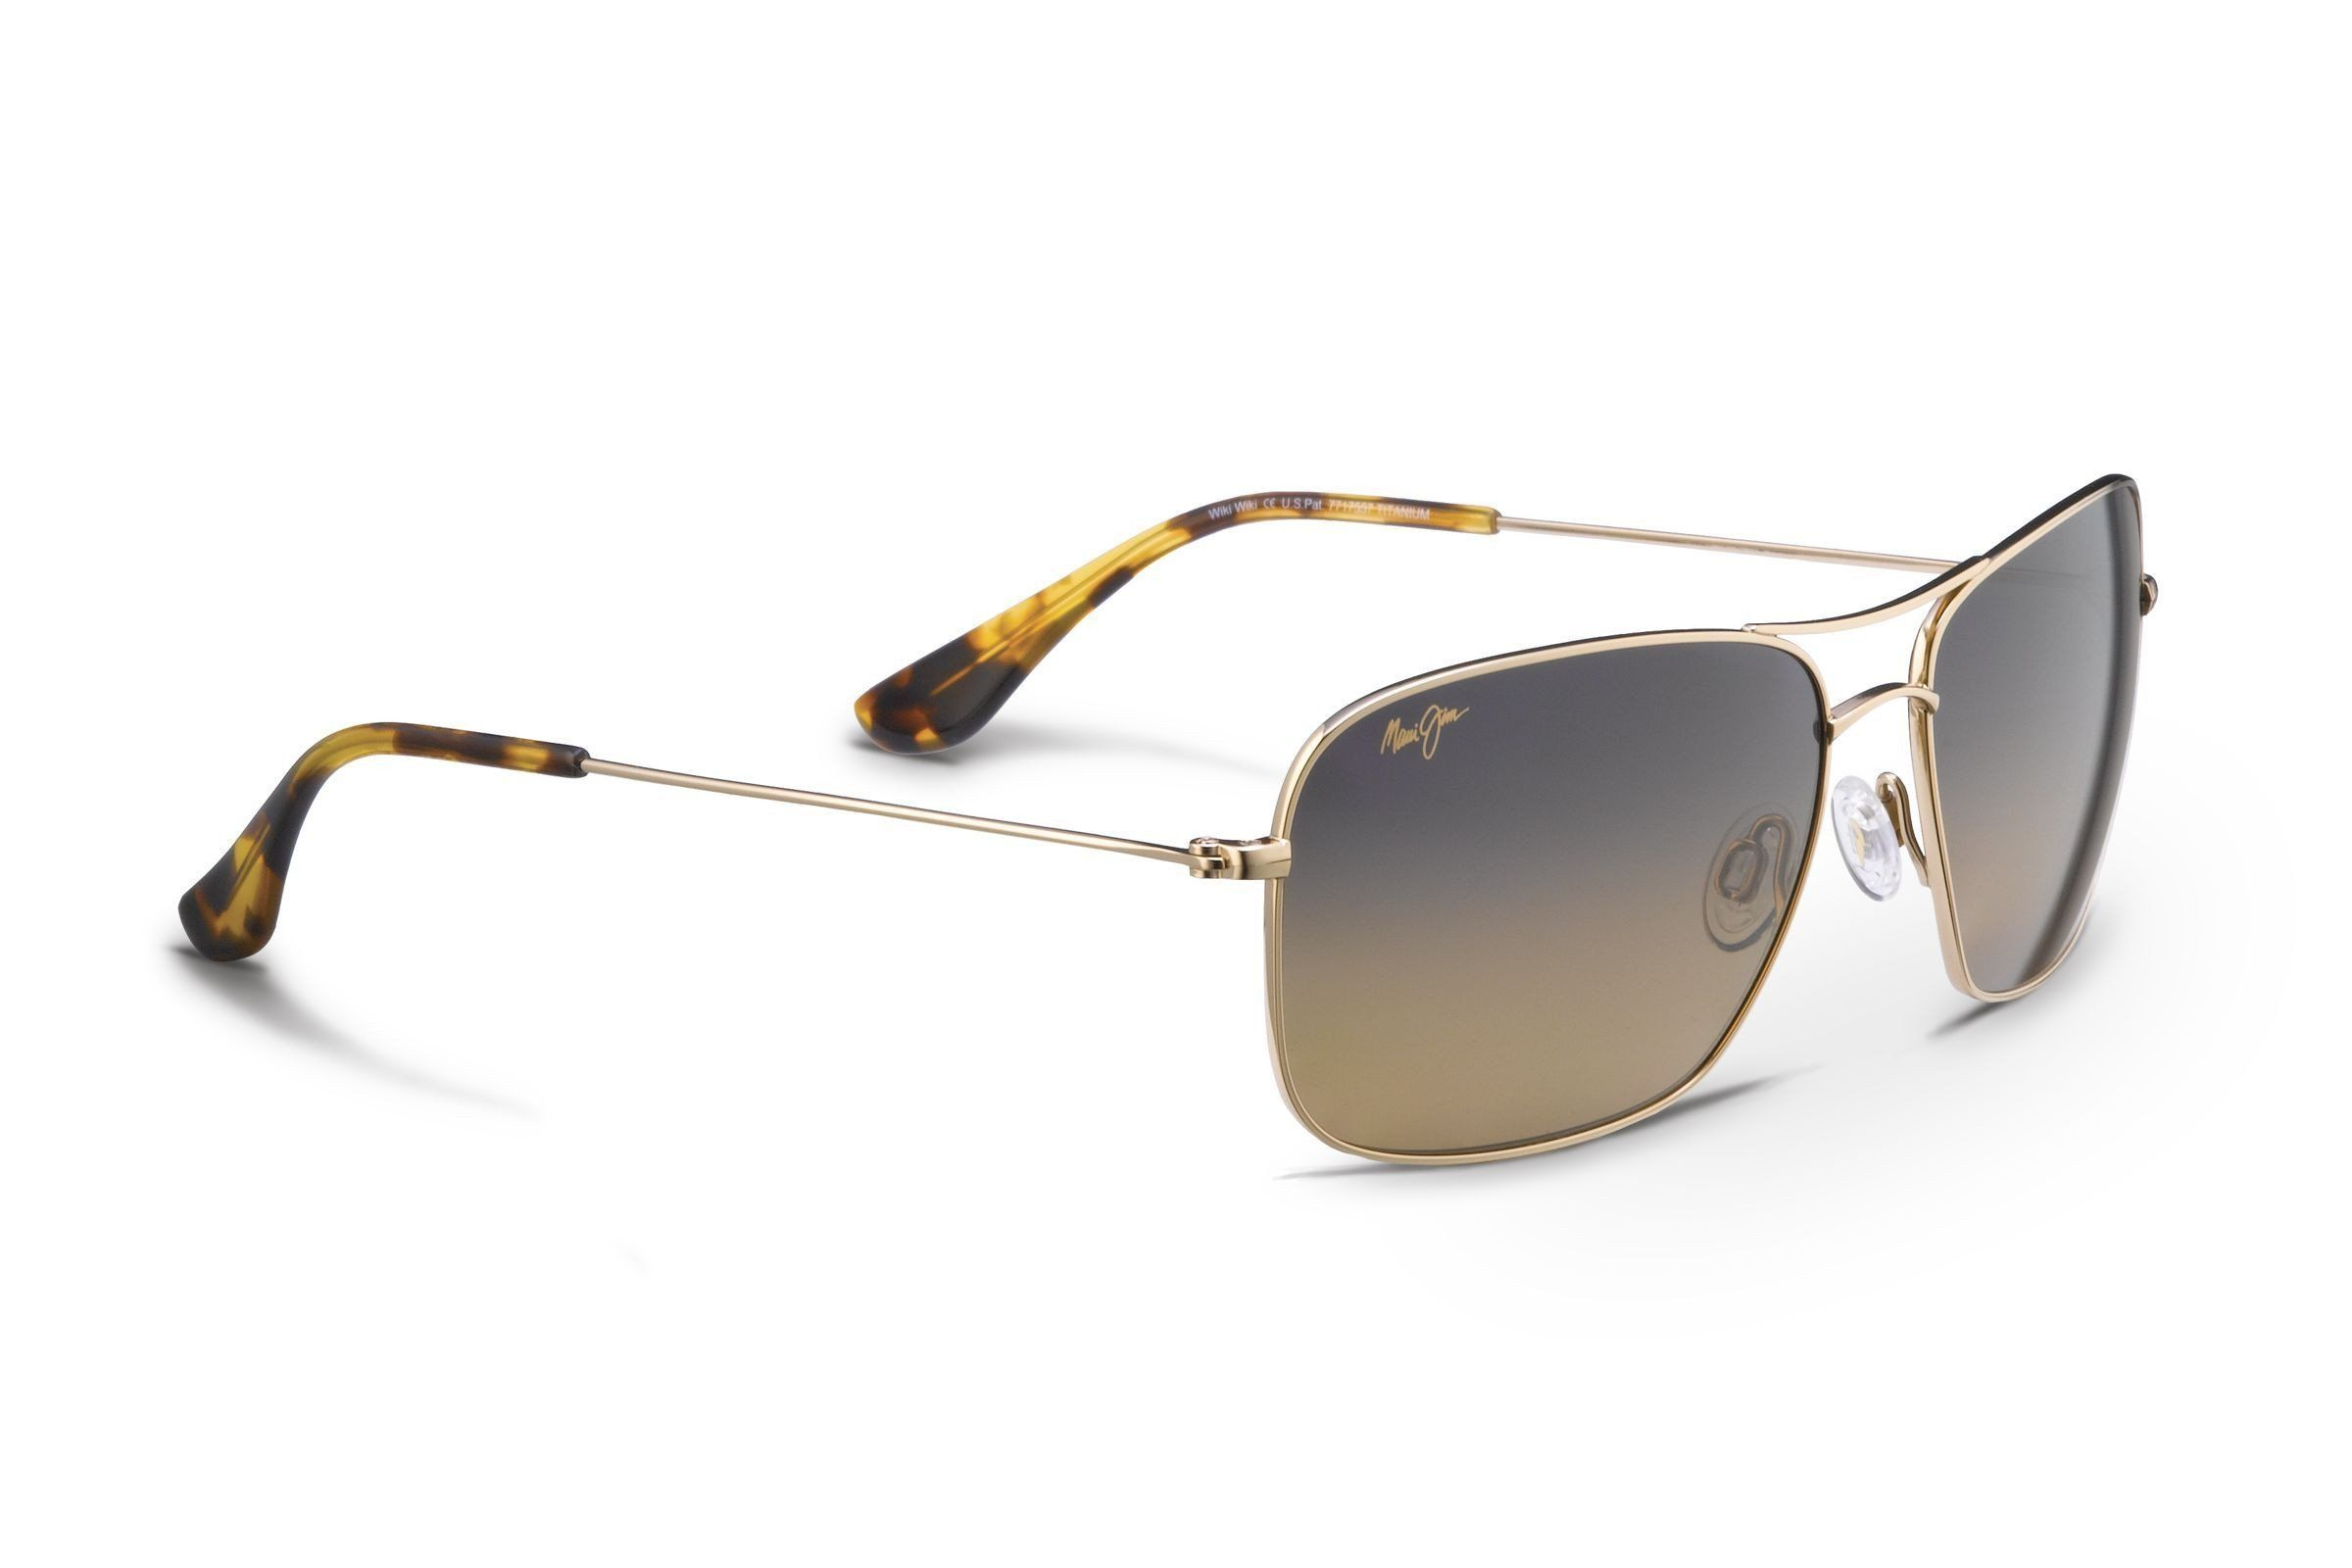 823f745bc66 Maui Jim Wiki Wiki Sunglasses